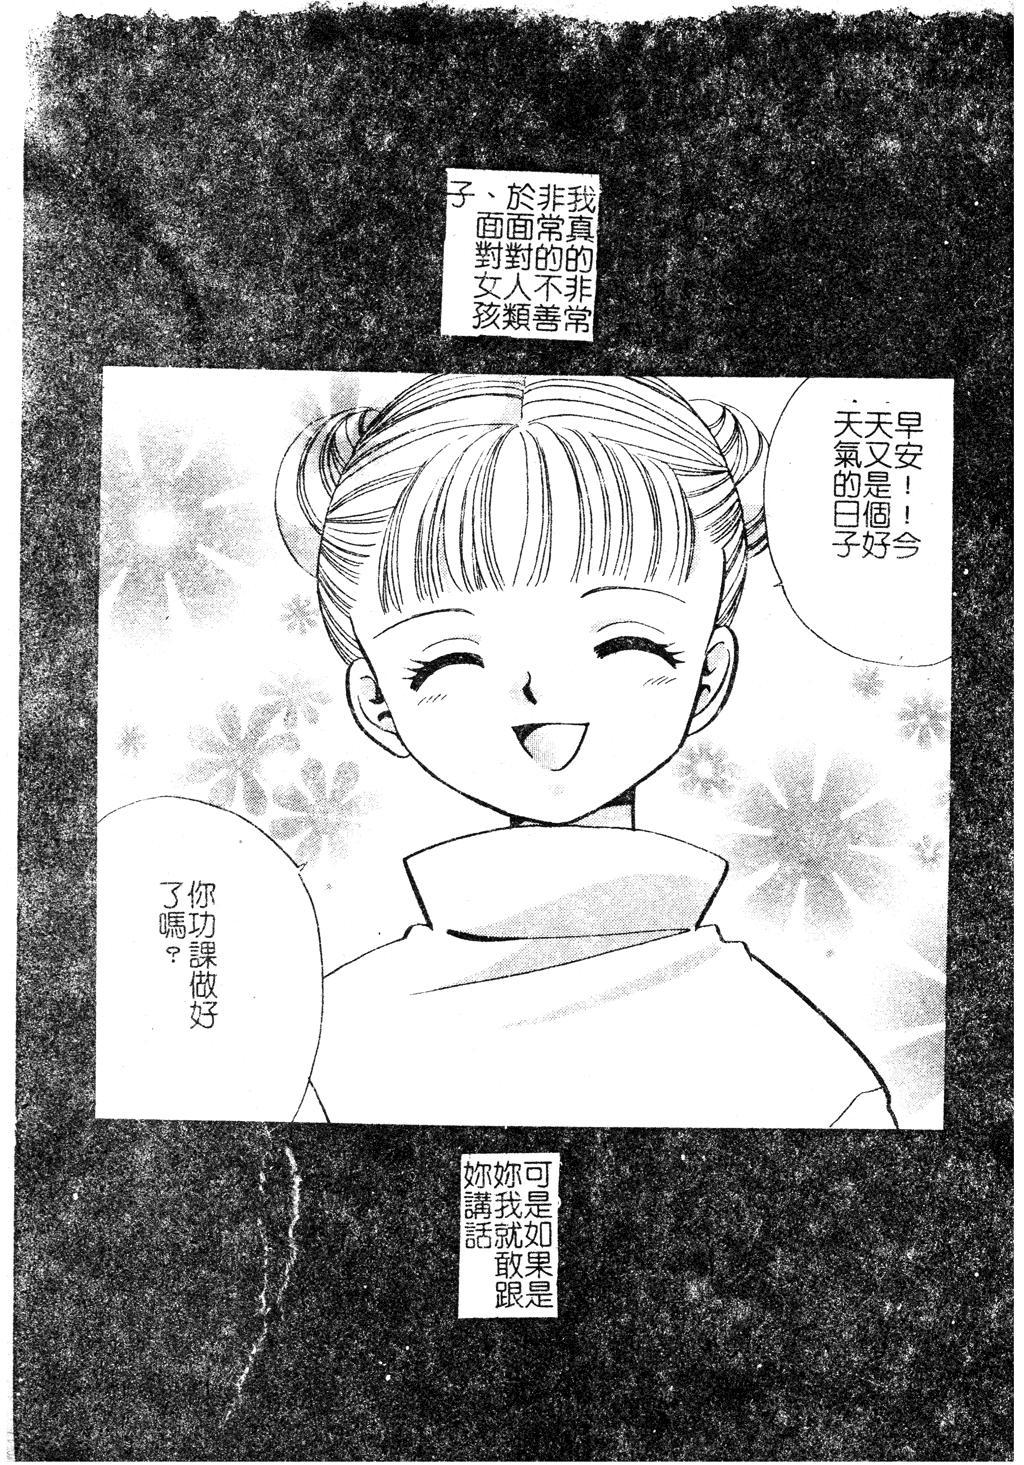 DenNow Koihime Collection 7 167